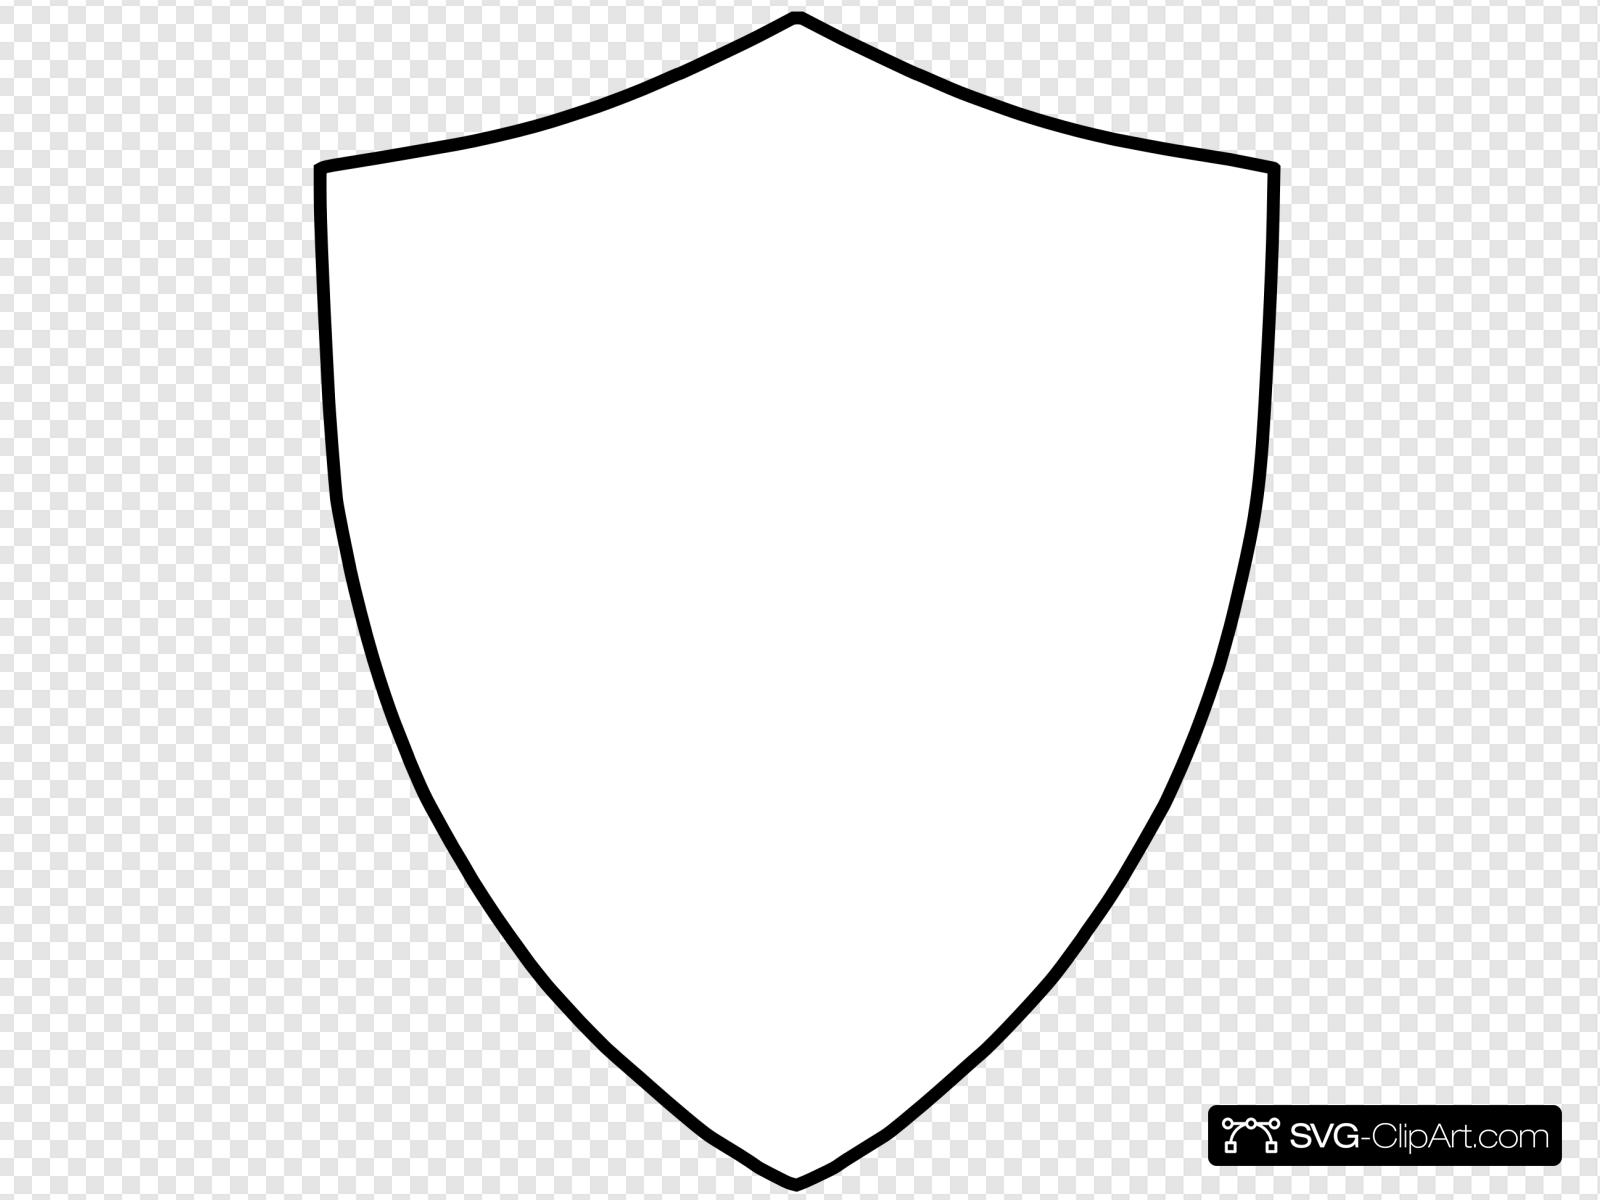 Badge outline clipart freeuse download Badge Outline Clip art, Icon and SVG - SVG Clipart freeuse download